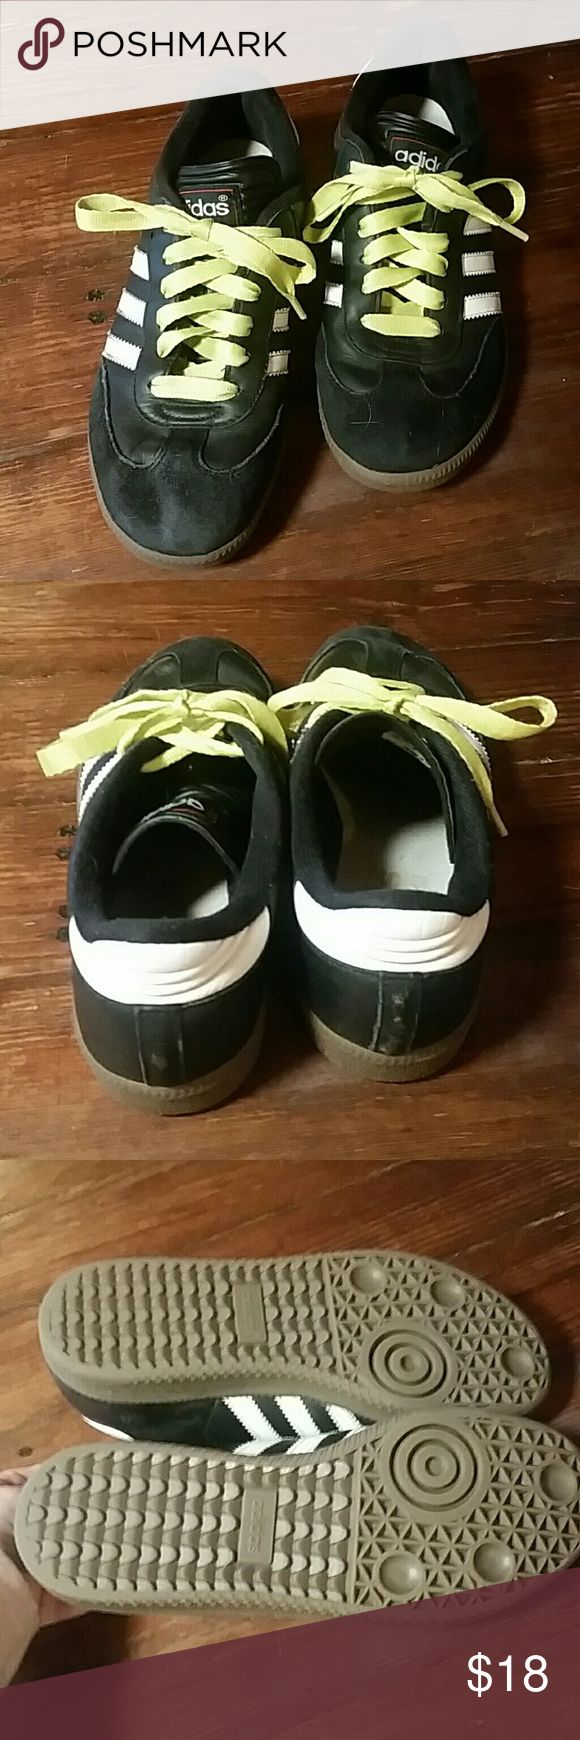 ADIDAS SAMBA SOCCER SHOES LIKE NEW ADIDAS SAMBA SOCCER SHOES LADIES SIZE 5.5 adidas Shoes Athletic Shoes